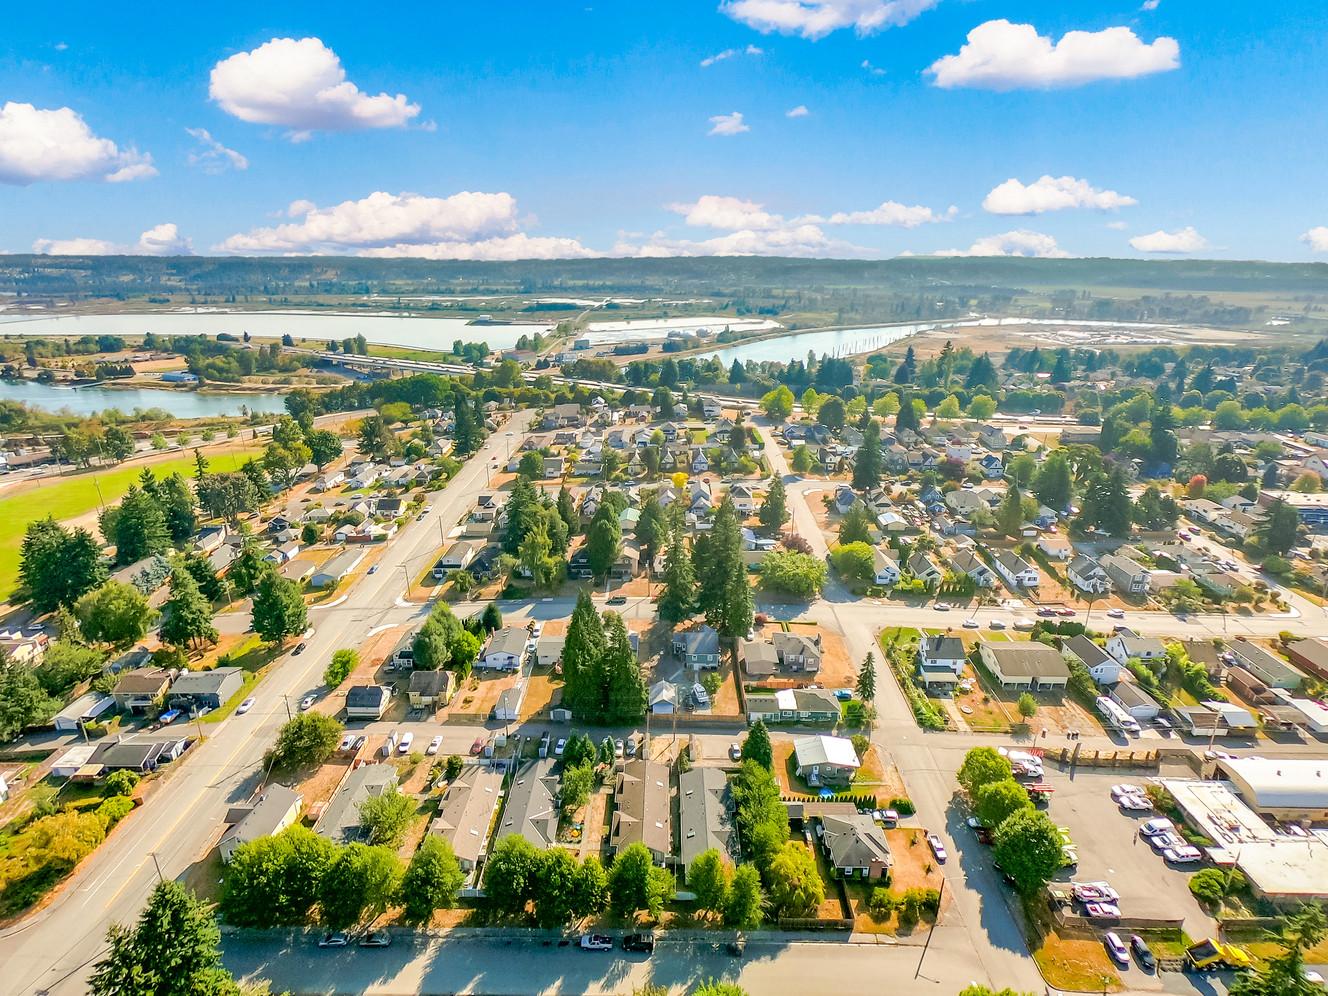 Everett, Washington State